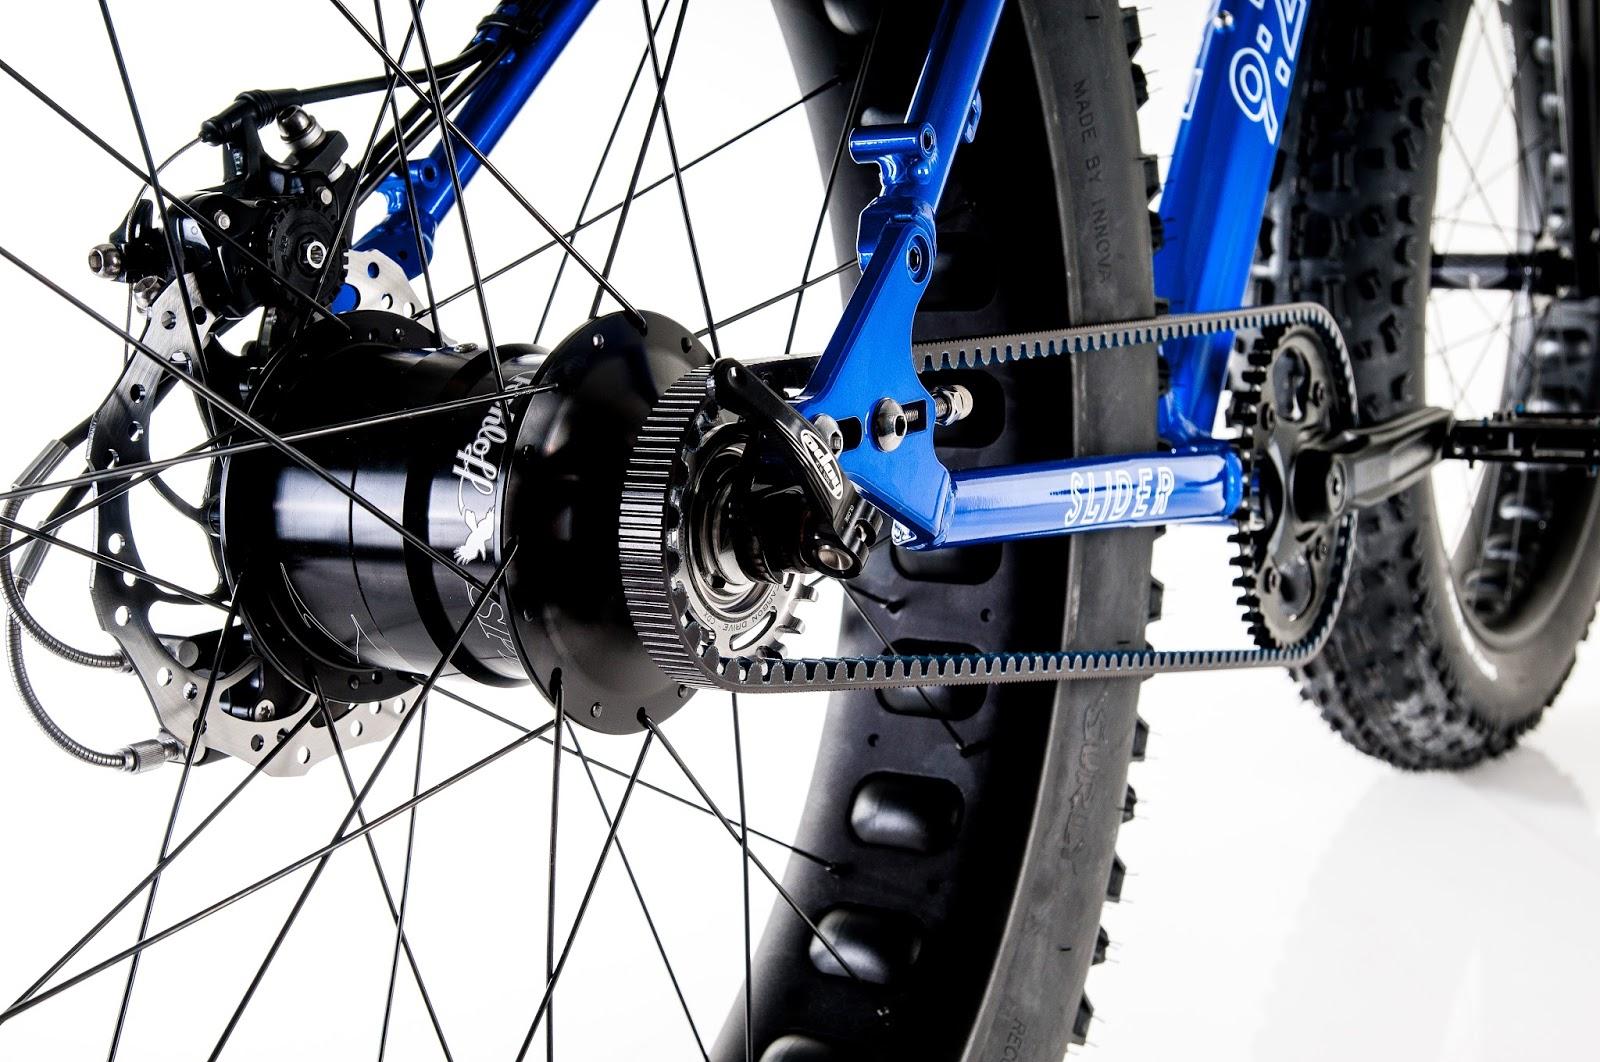 The Monkey Lab 9 Zero 7 Fat Bike With Rohloff Speedhub